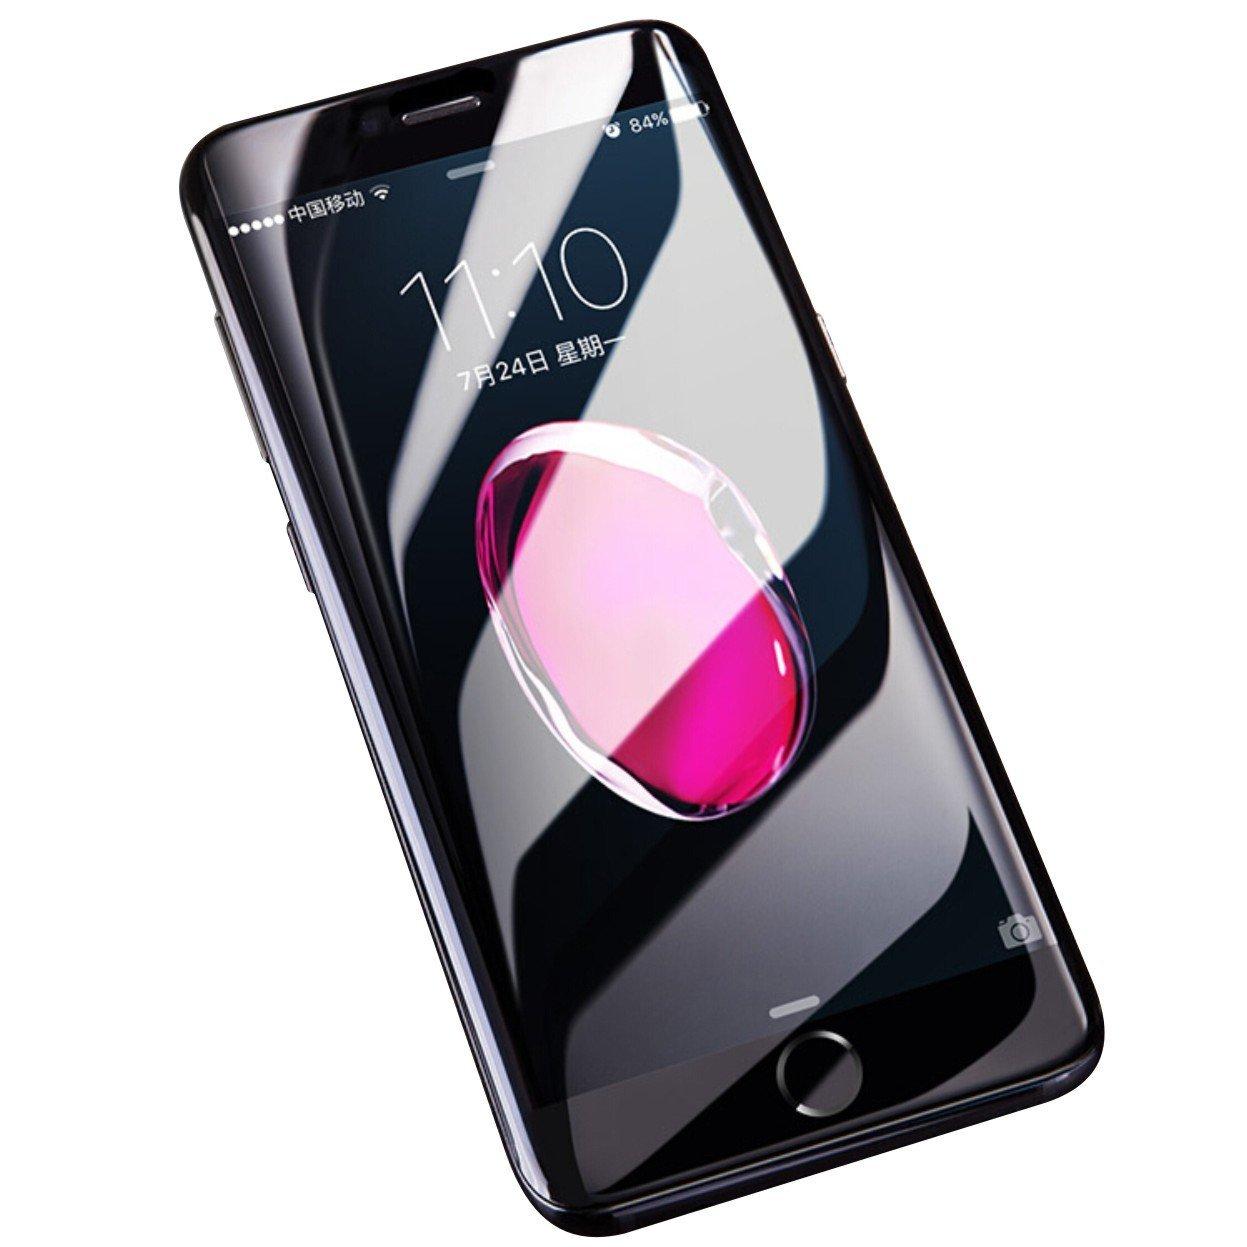 TIYA táo ở Ostia. IPhone6s thuỷ tinh công nghiệp phim 6s/ táo Apple 6 chung cả hai lần độ nét cao ba